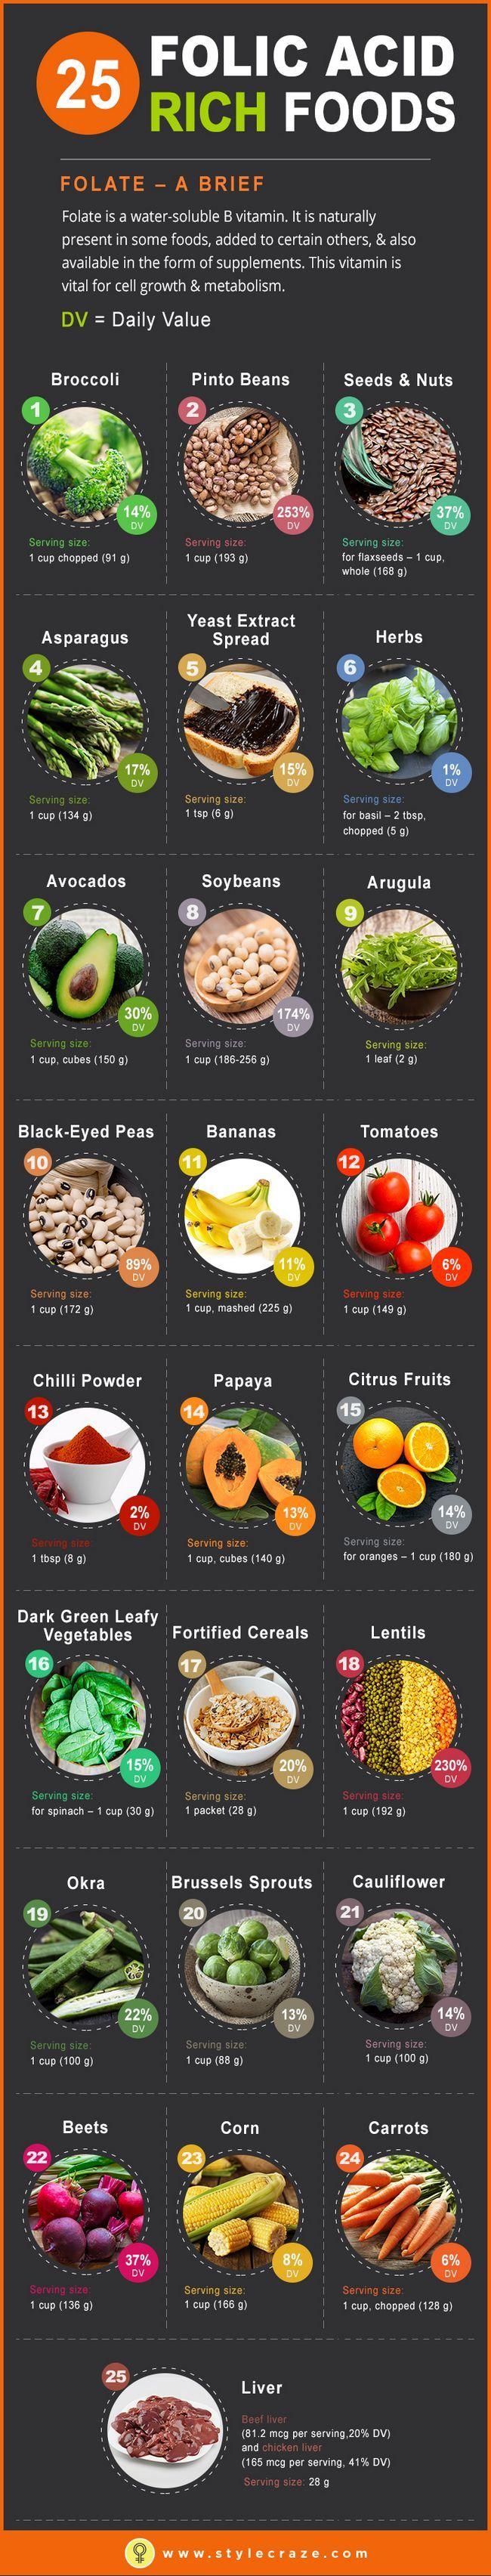 Top 25 Lebensmittel, die reich an Folsäure